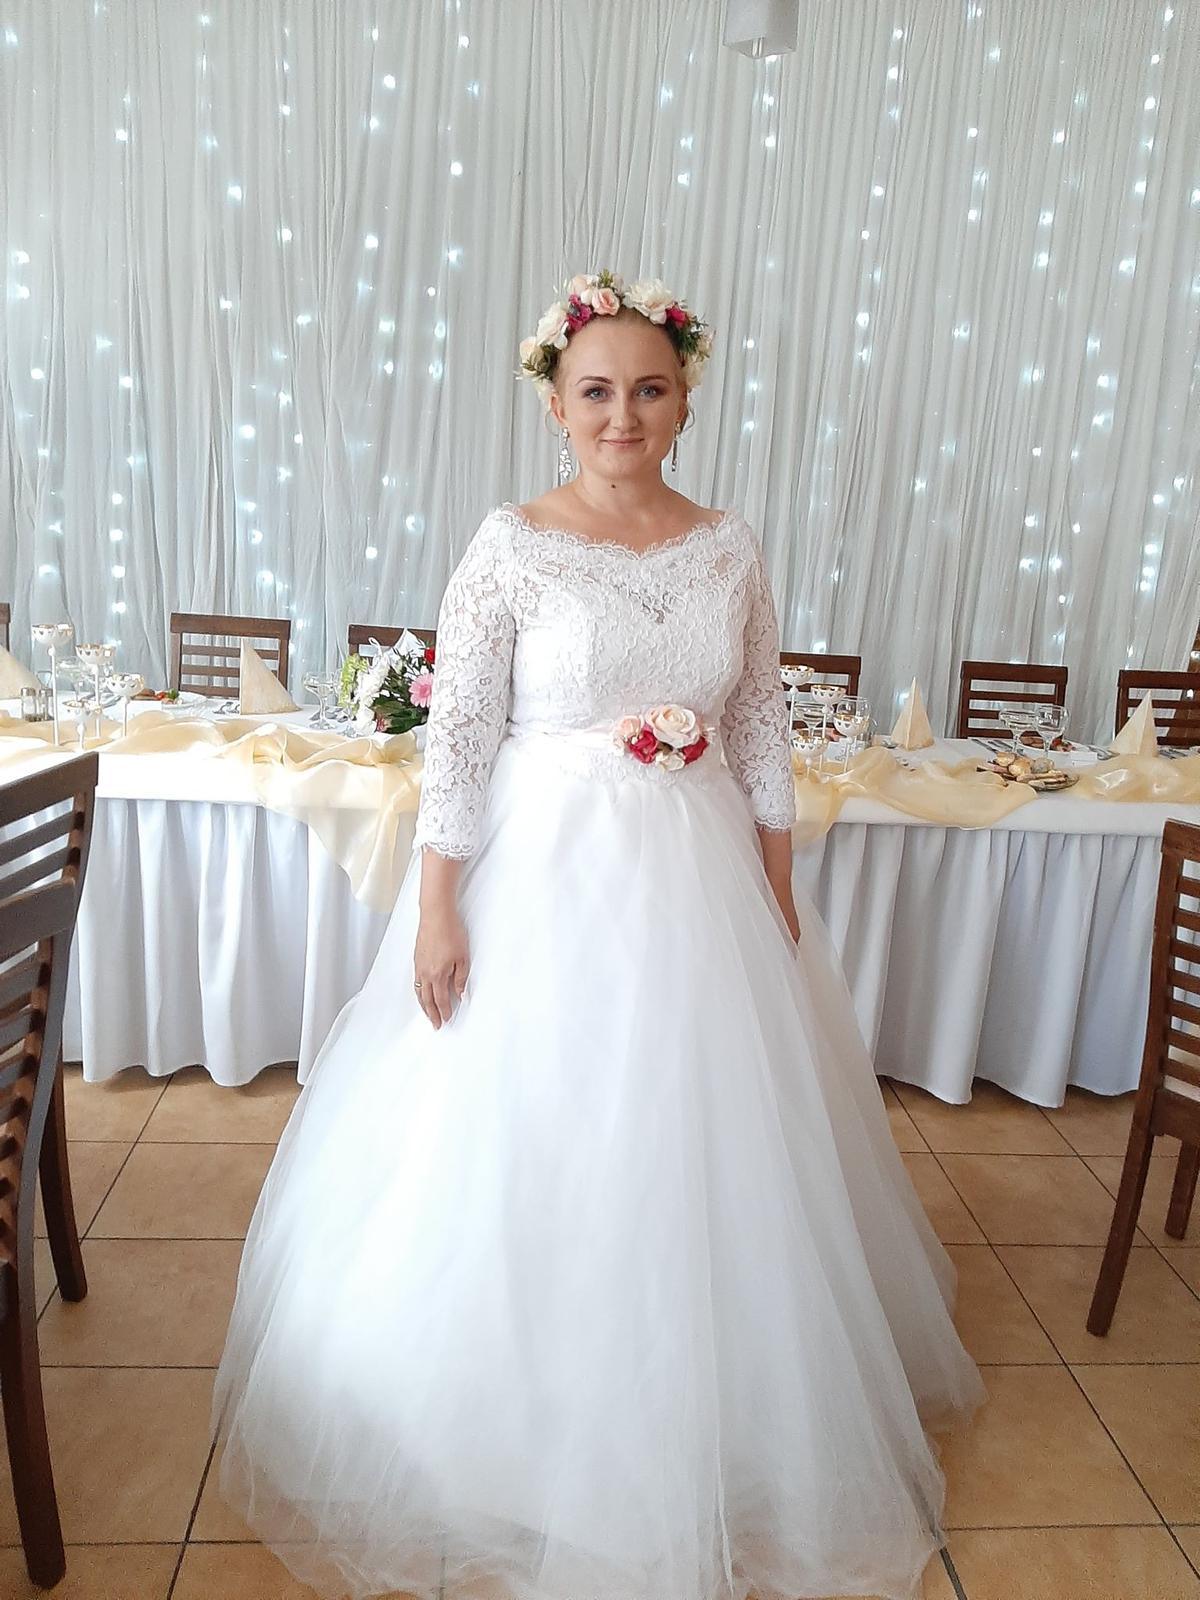 Svadobné šaty - komplet - Obrázok č. 3